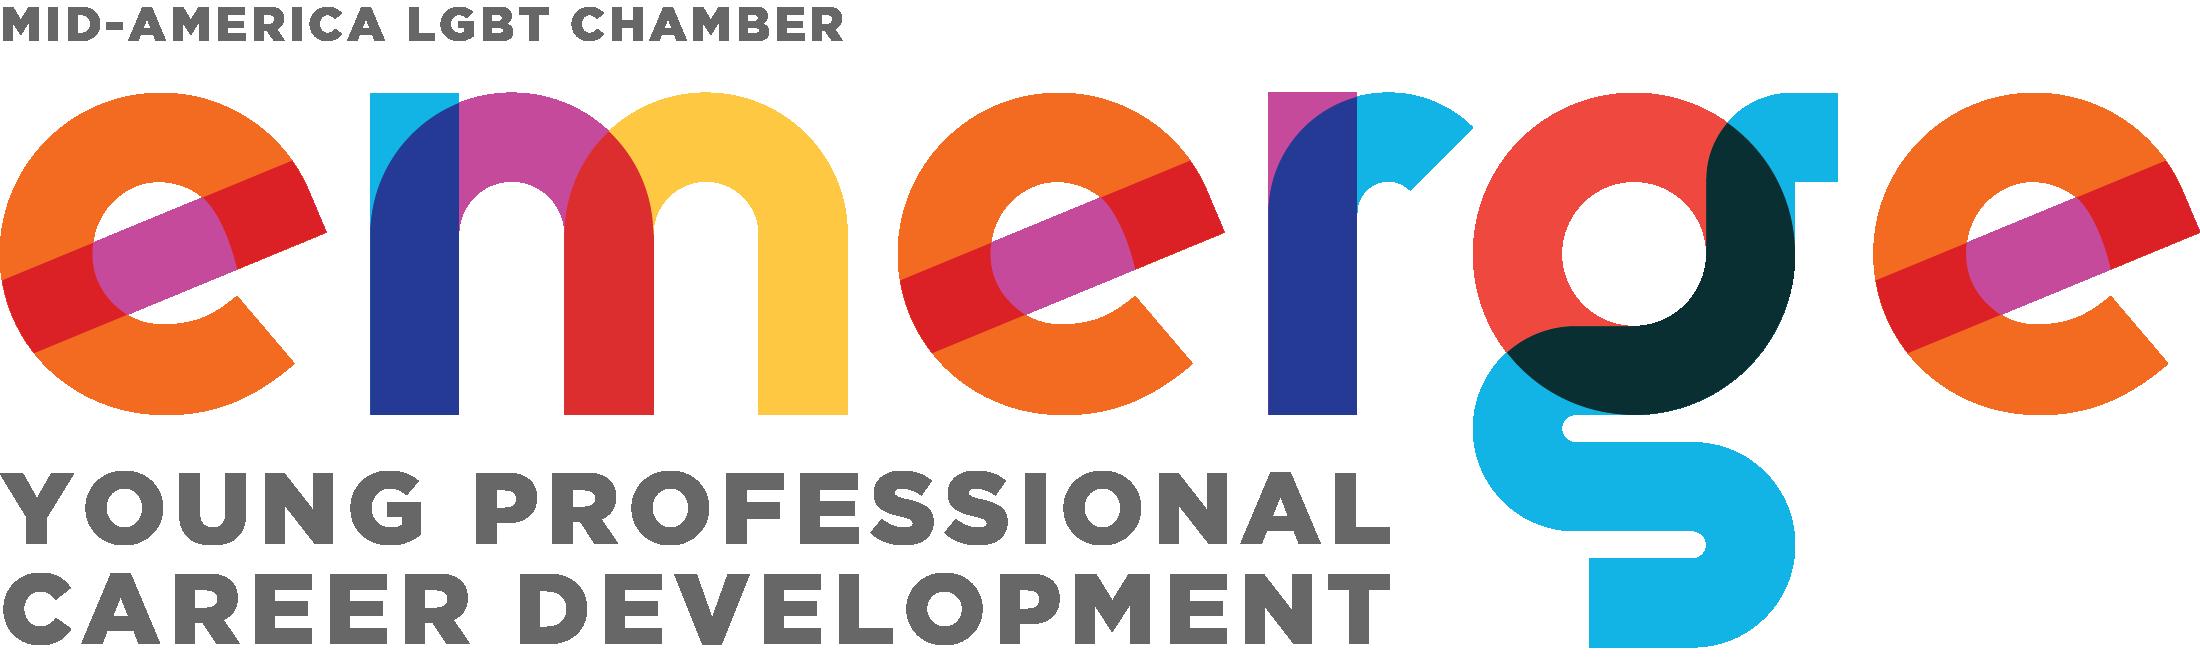 midamericalgbt-program_logos-emergex2